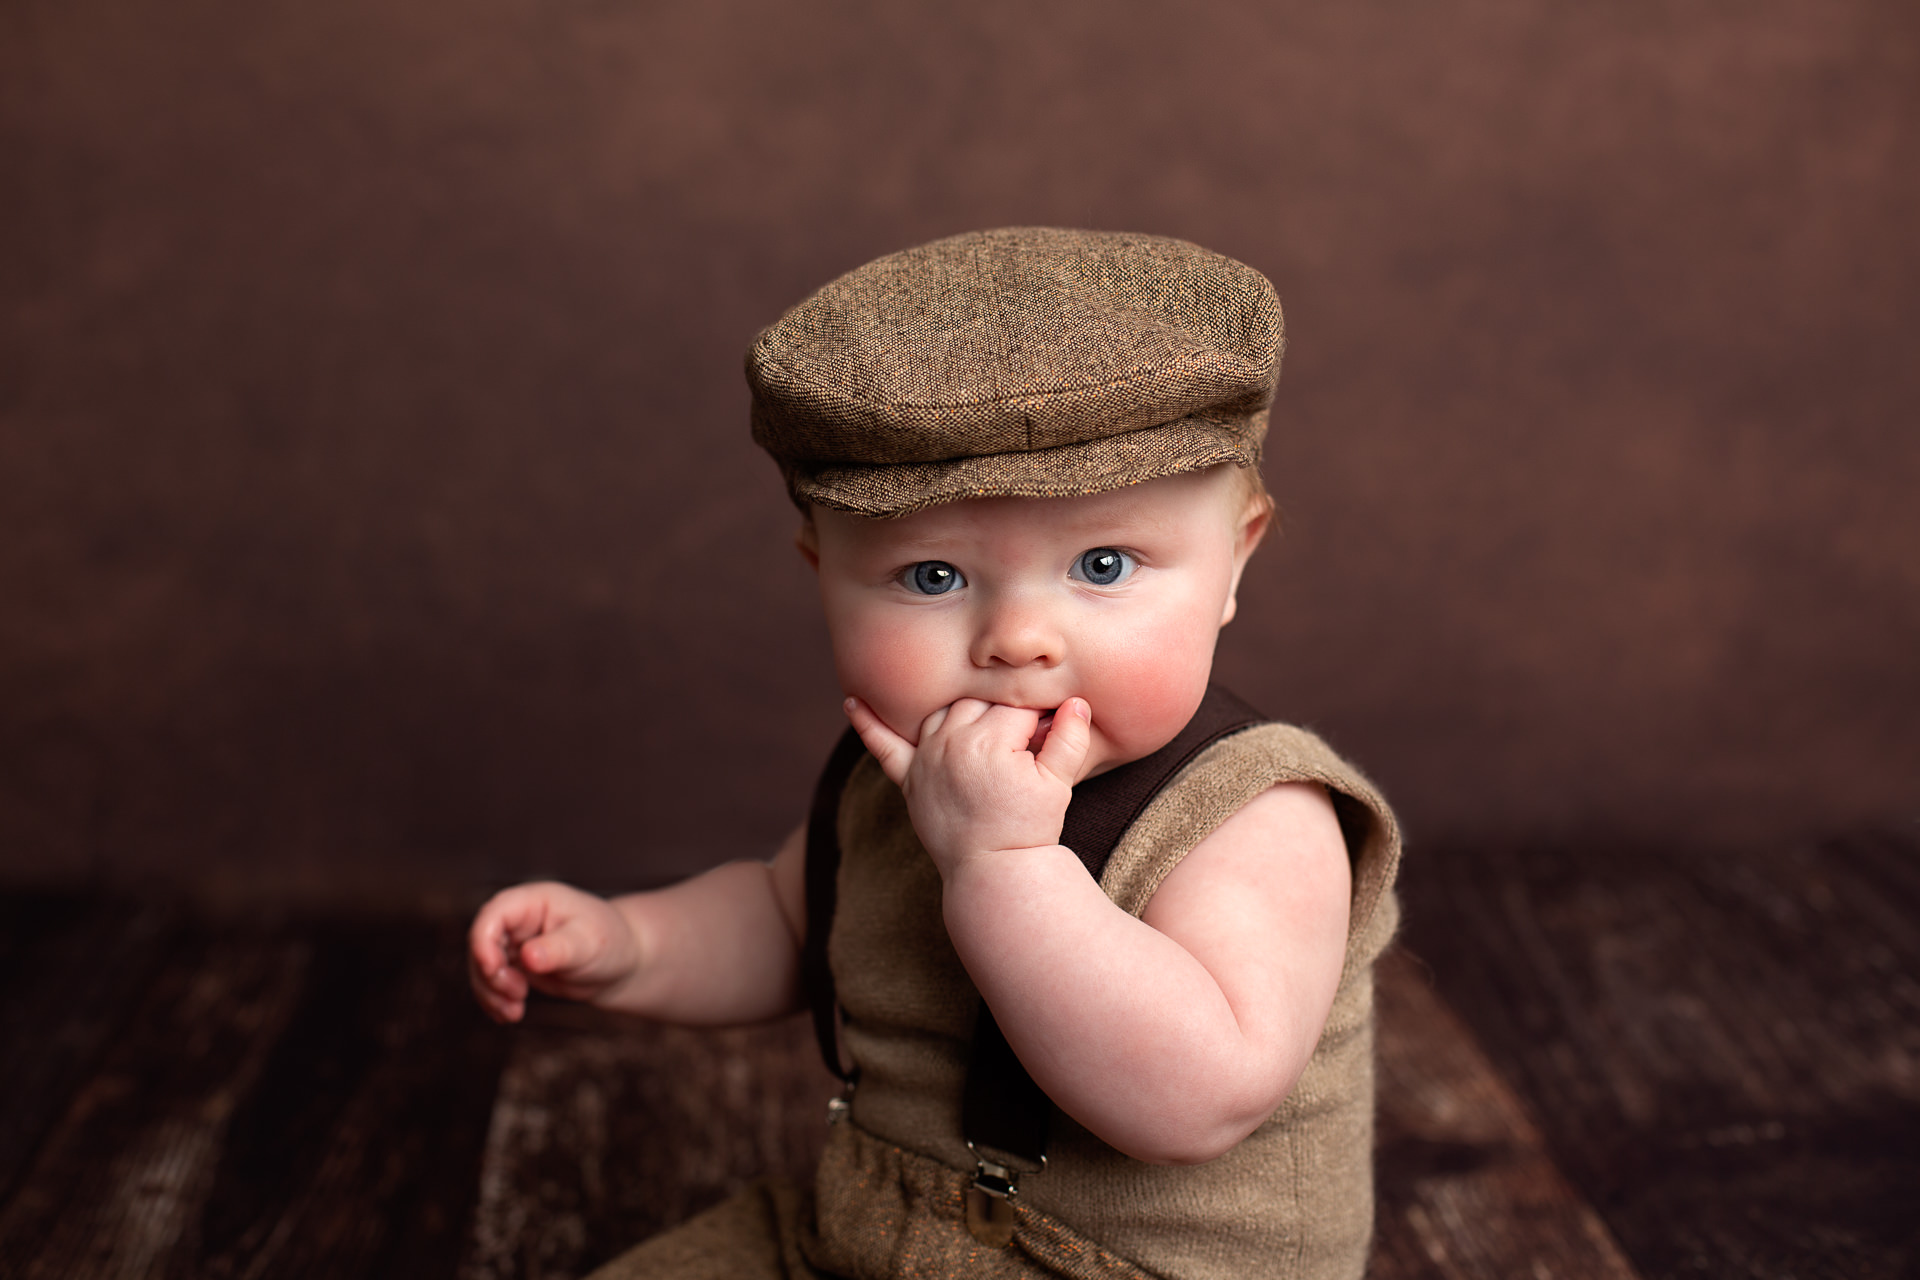 Baby Photographer Surrey 2020